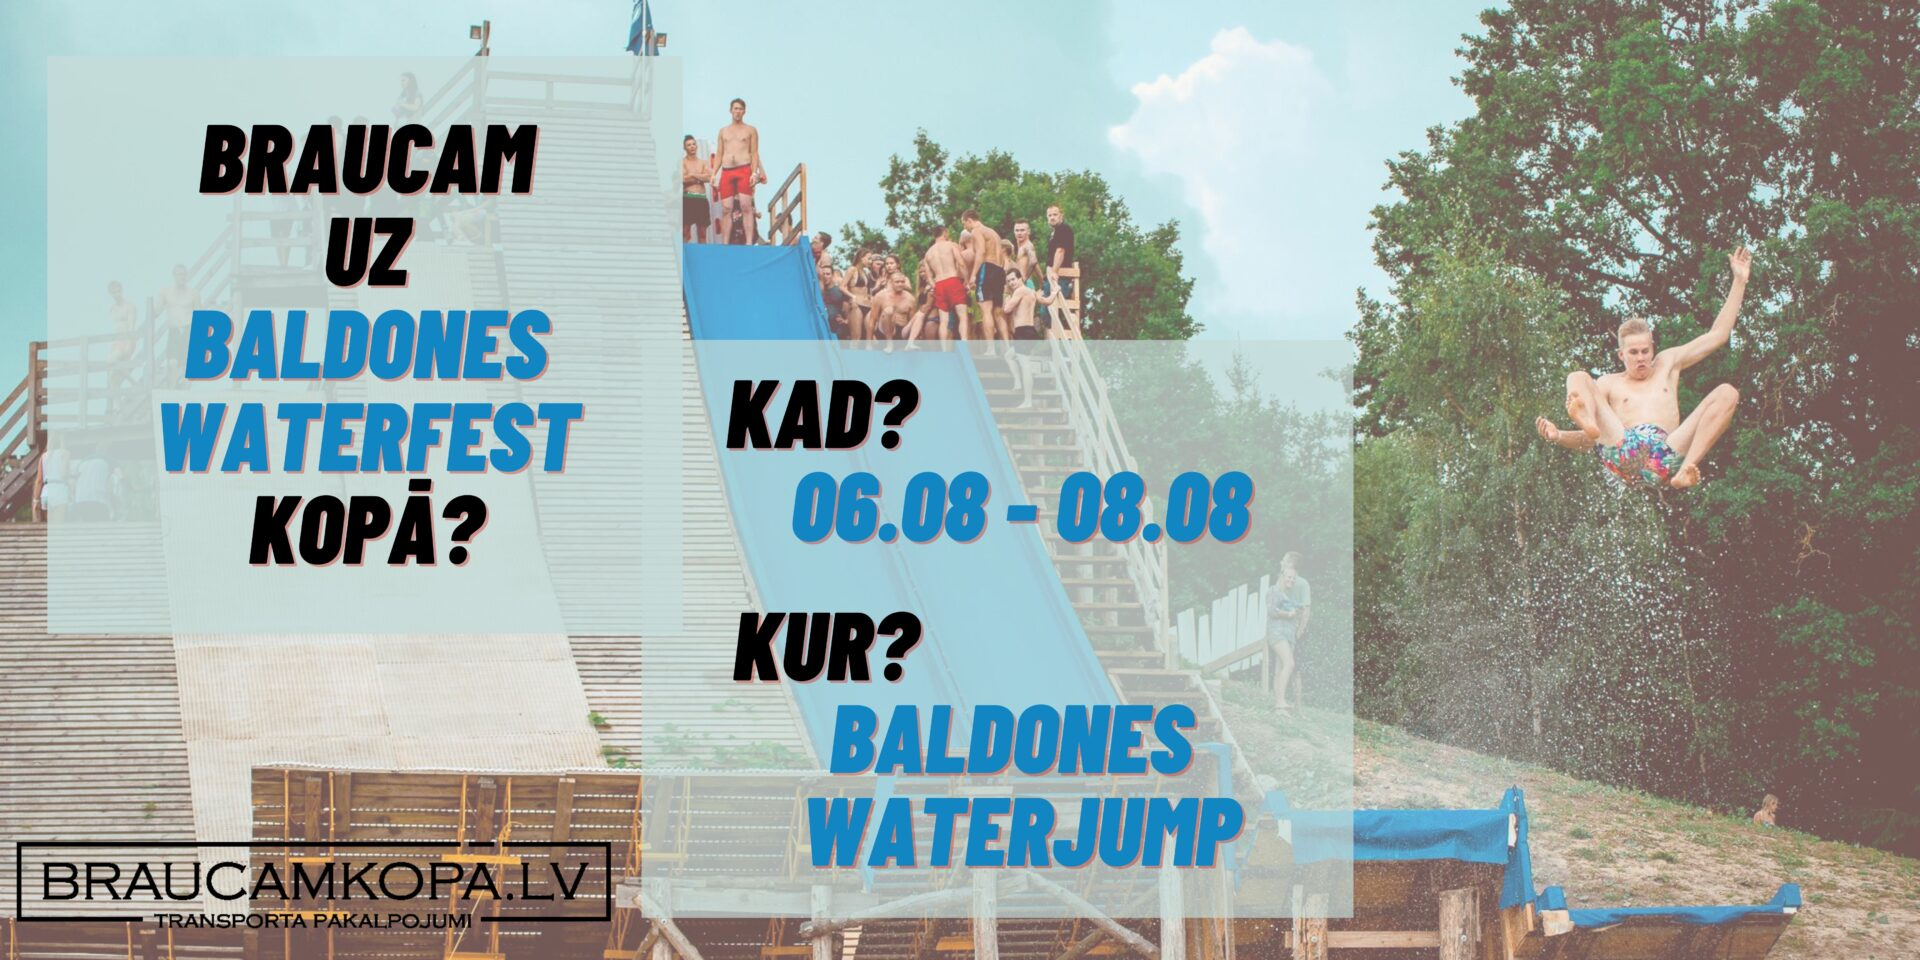 Baldones Waterfest, 06.08-08.08.2021